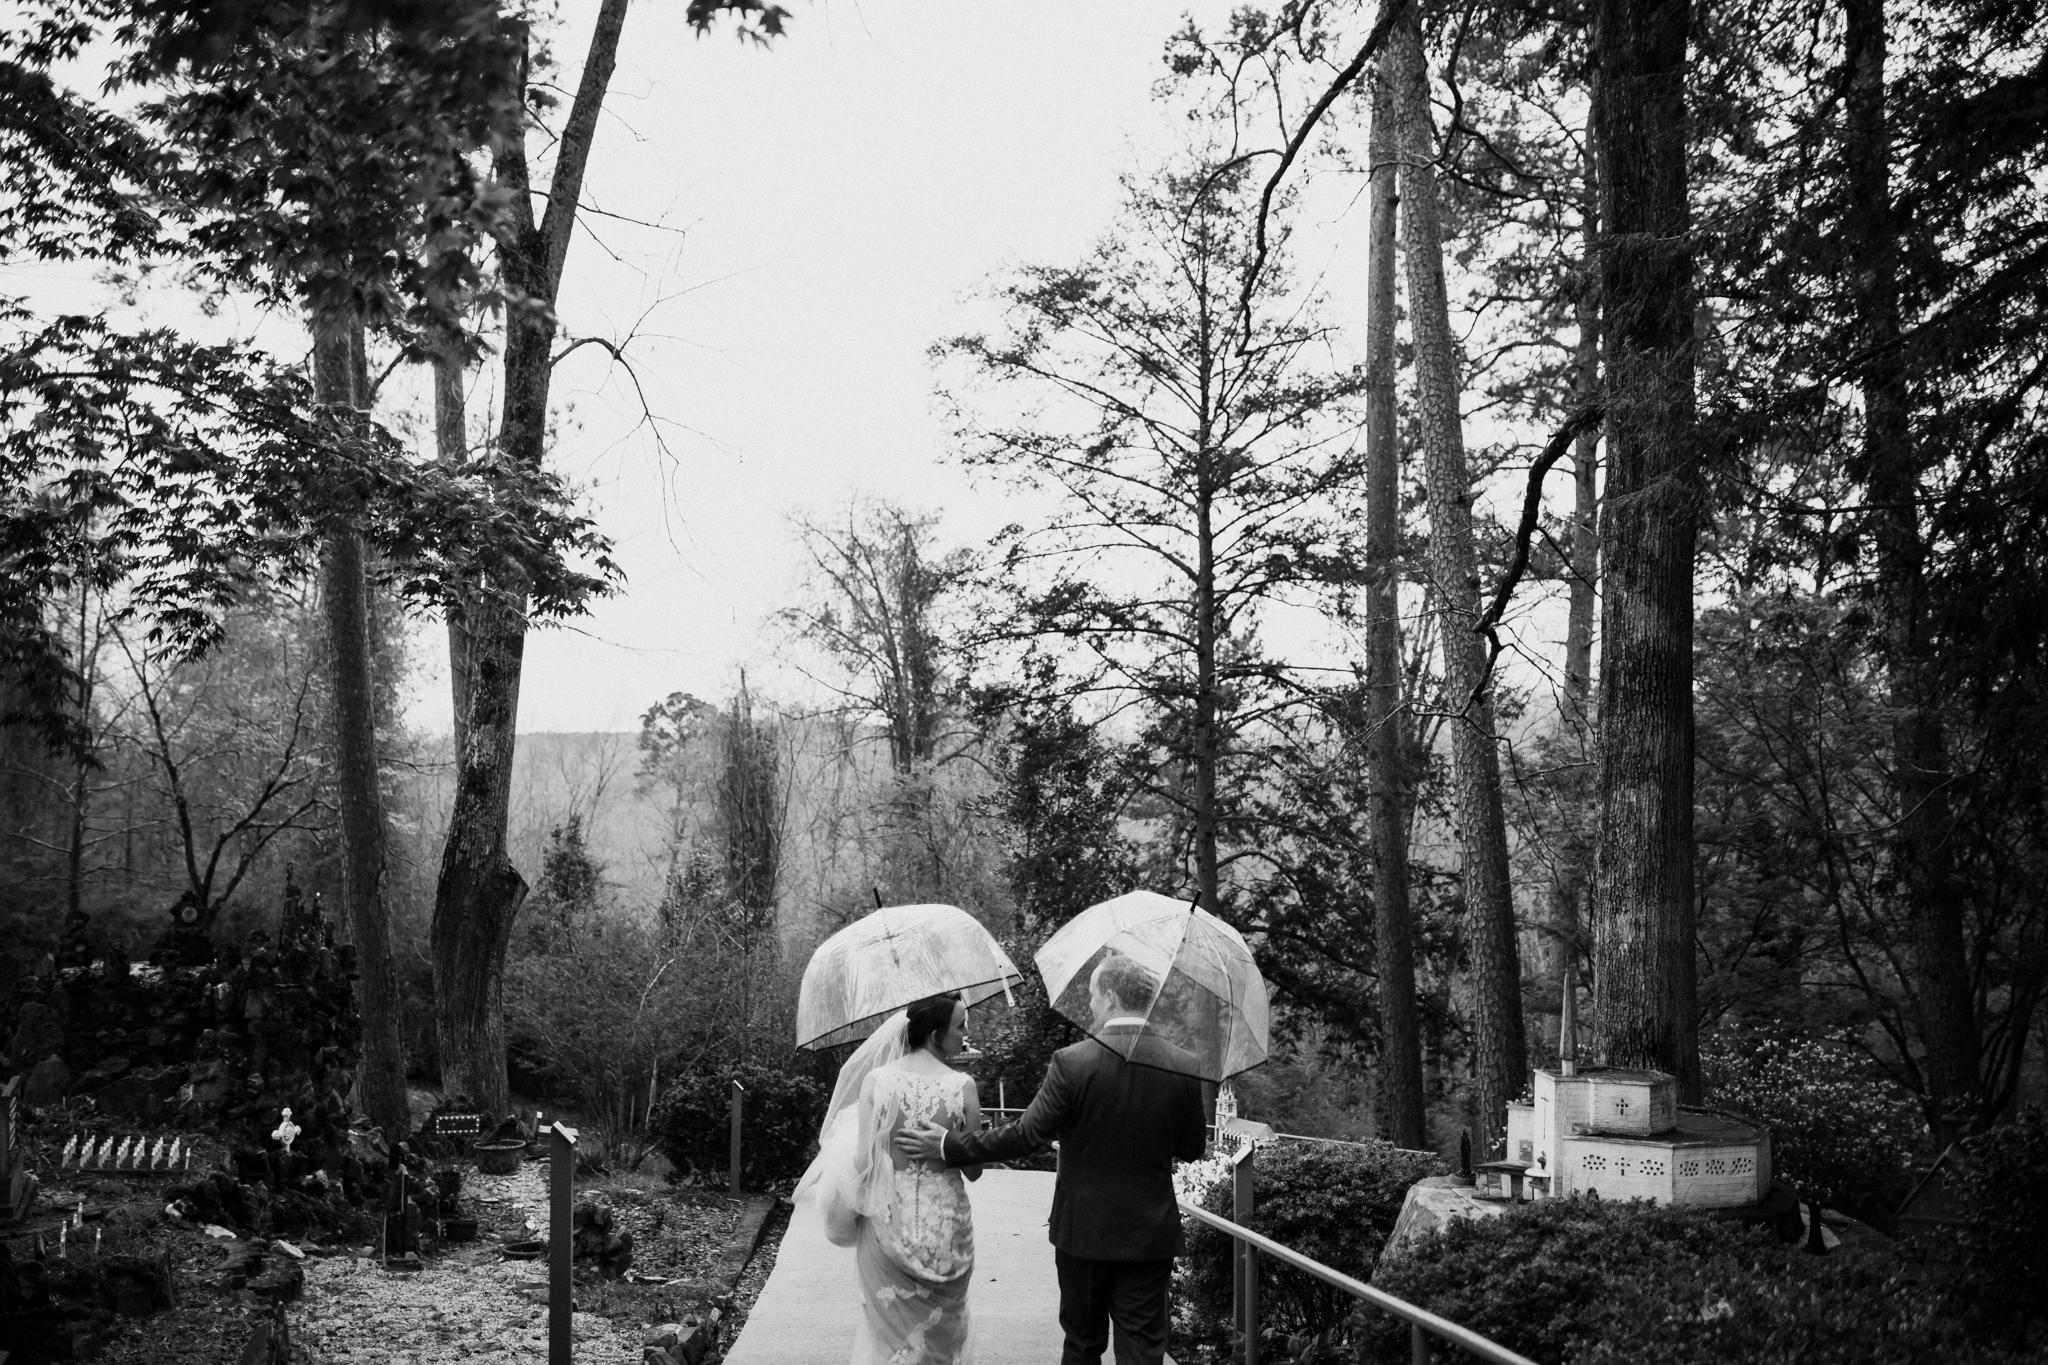 birmingham-alabama-wedding-photographer-laura-terry-the-warmth-around-you (59 of 110).jpg